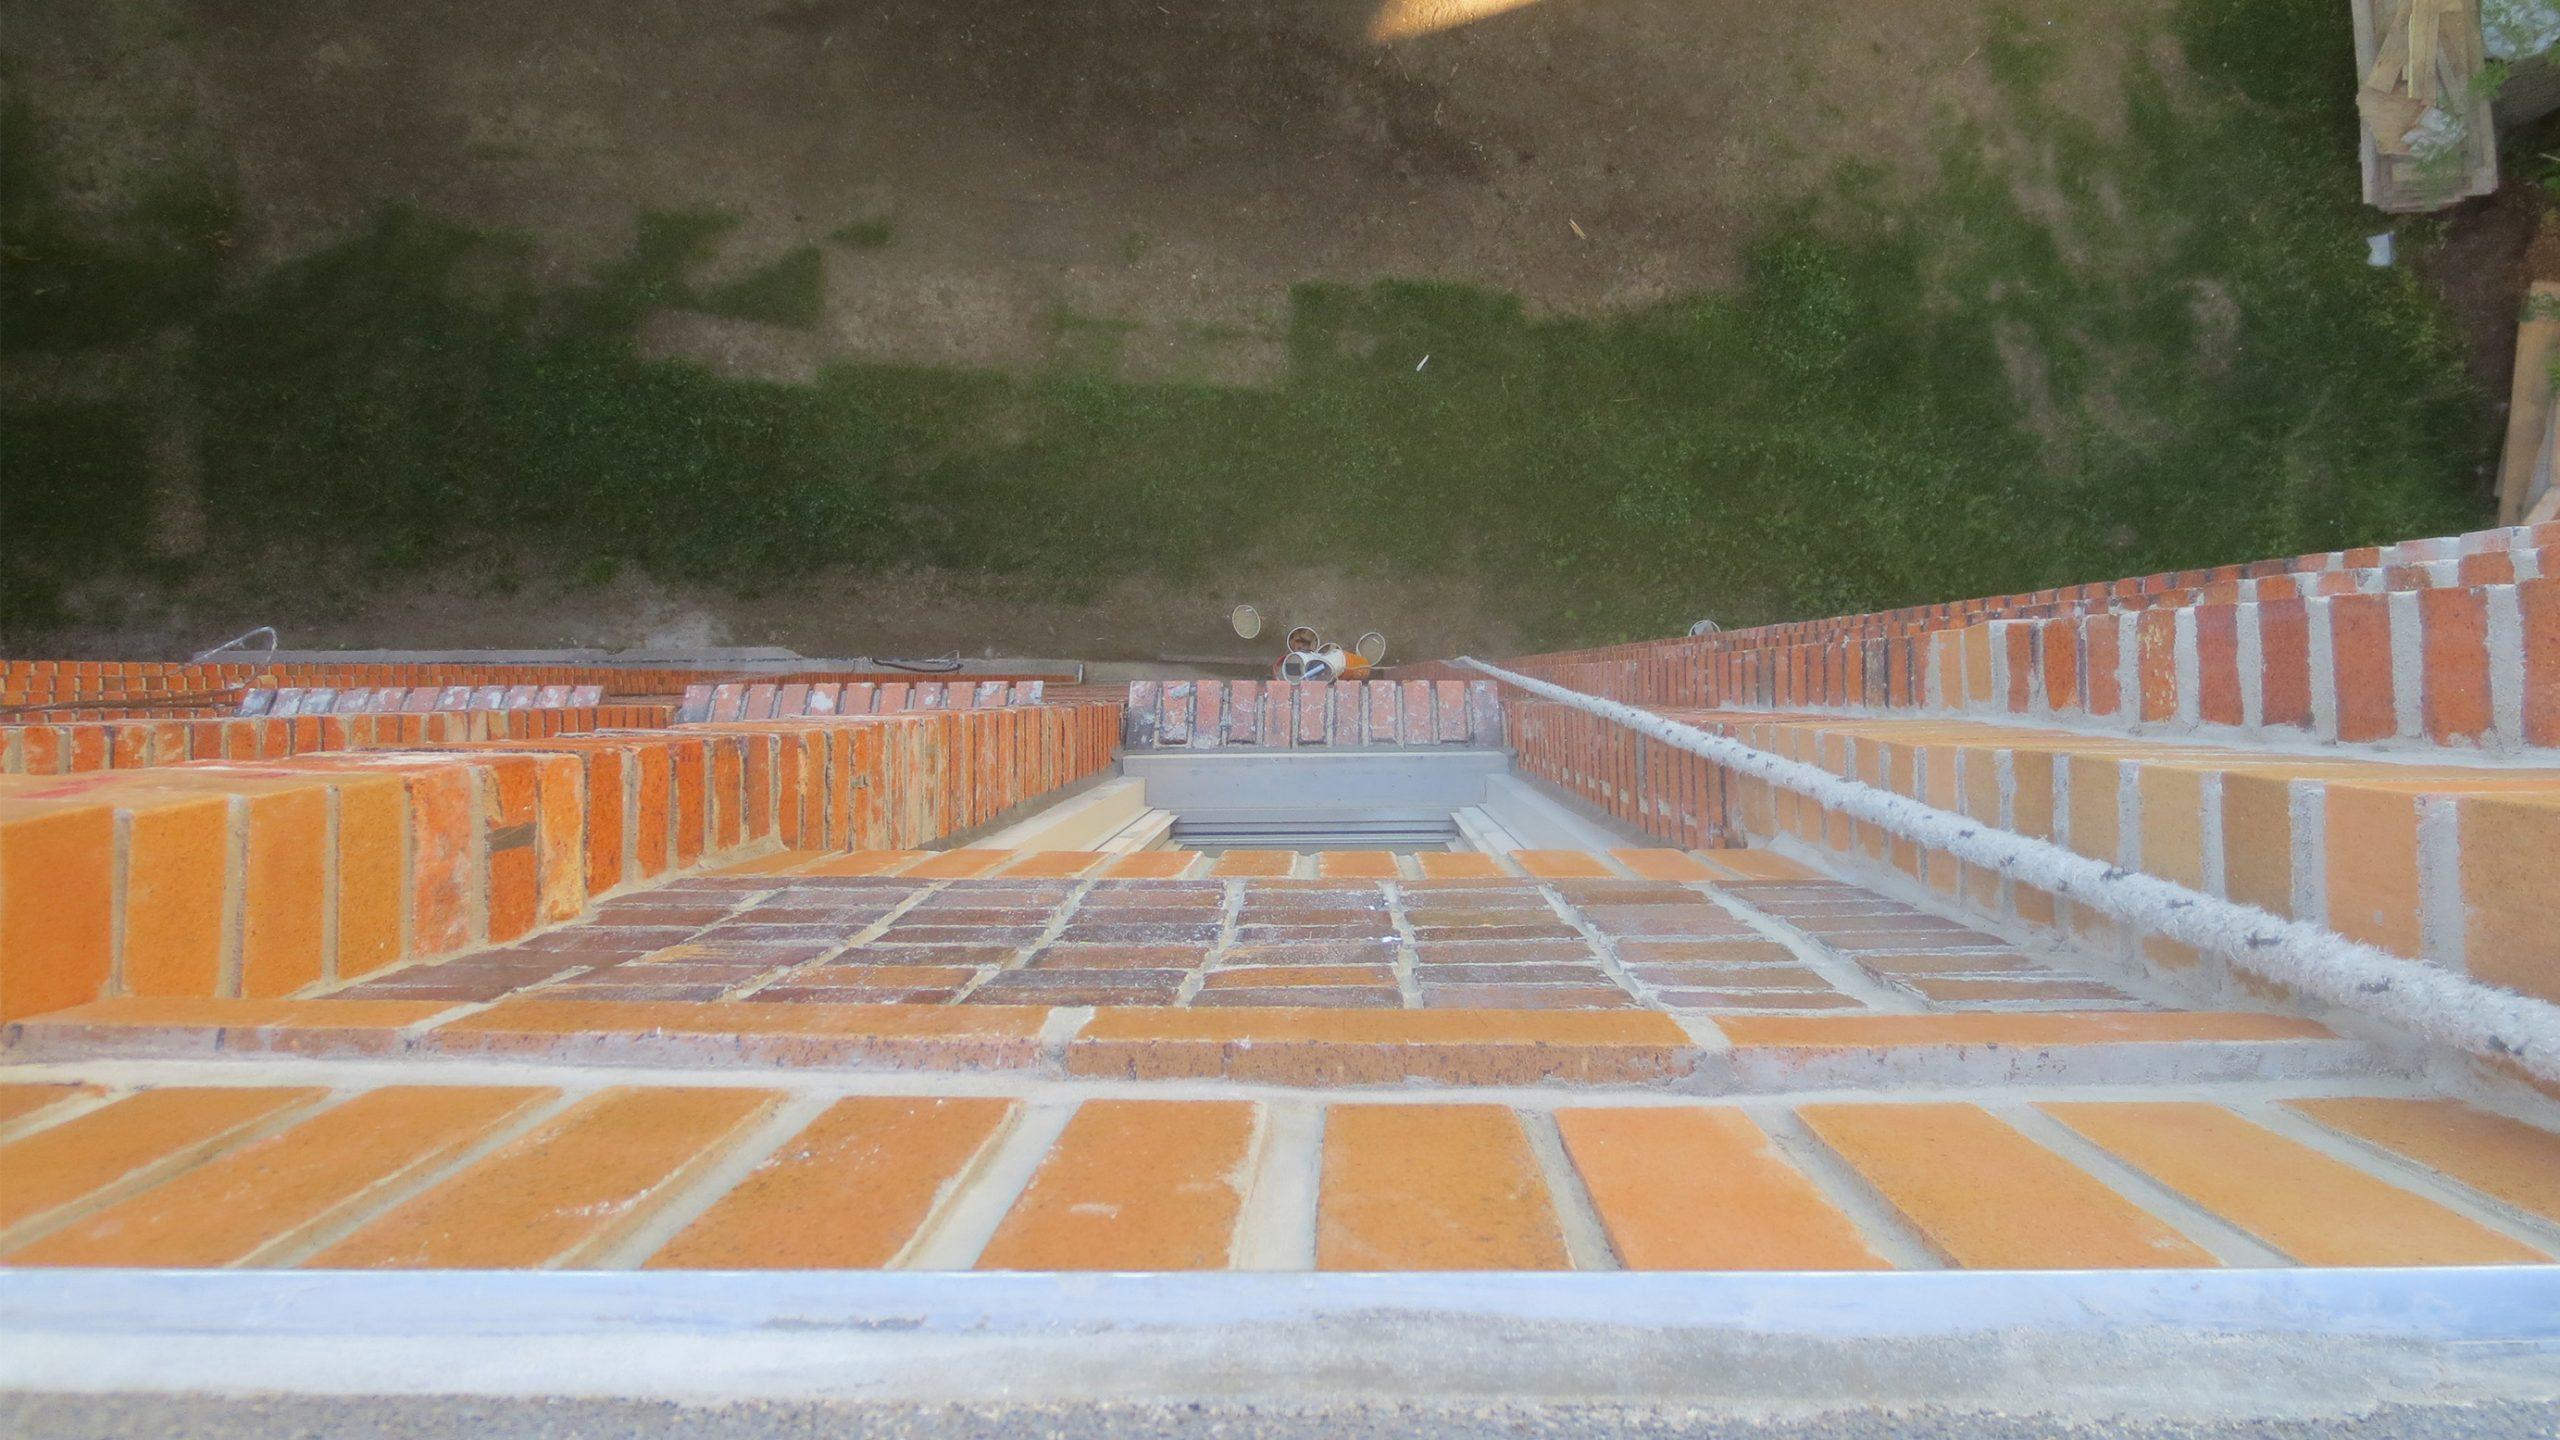 2-Paul-L-Dunbar-School-SDP_SCHRADERGROUP_May-Construction-Progress